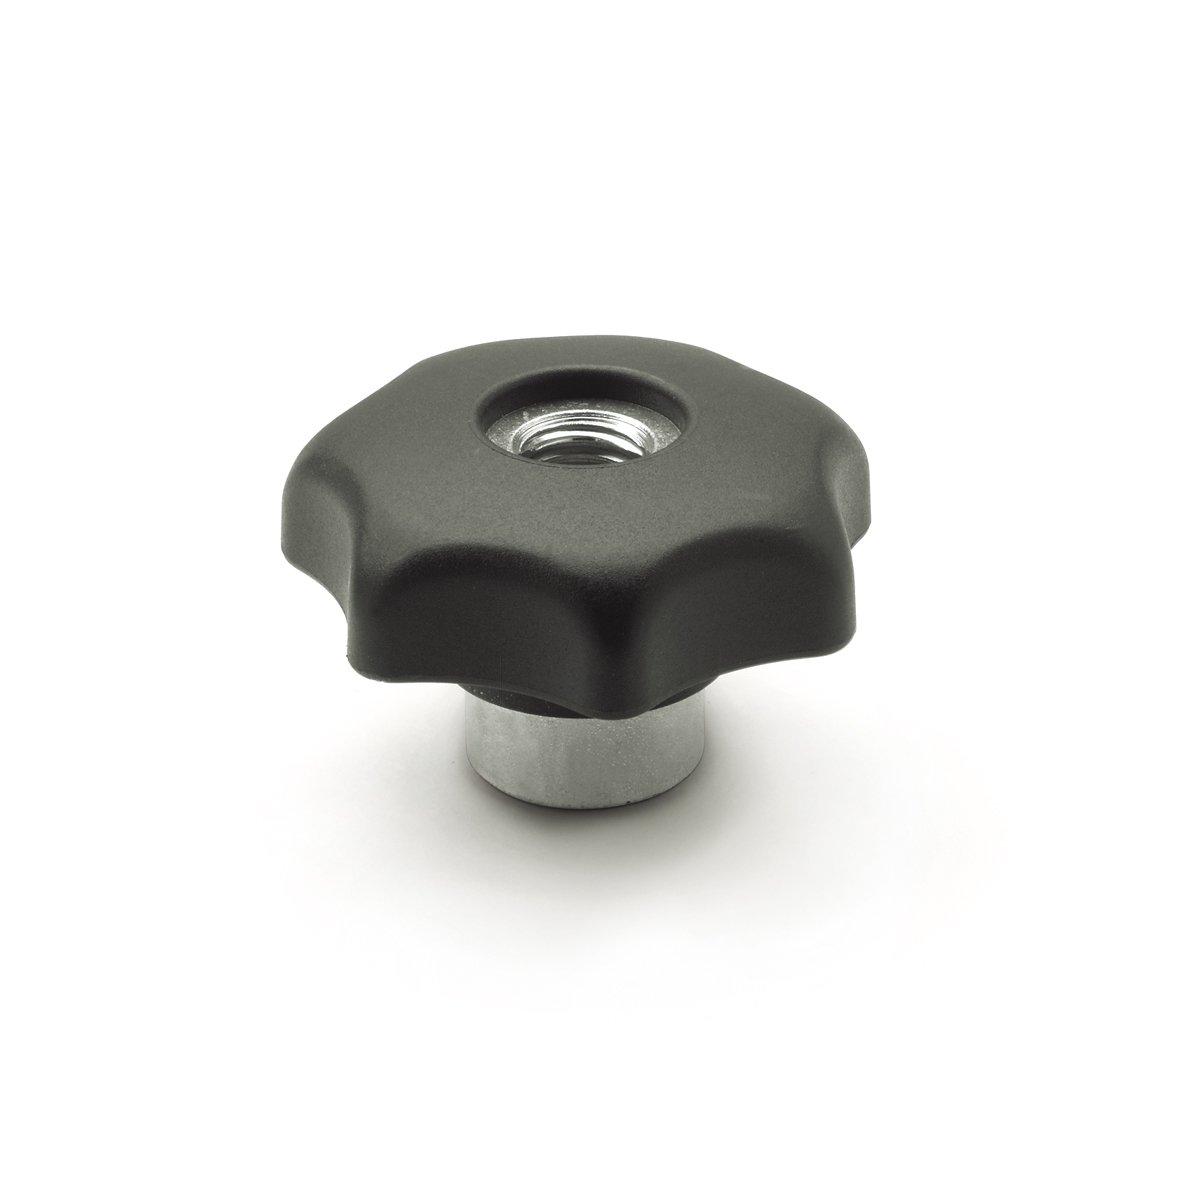 JW Winco Glass Filled Nylon Plastic Quick Release Hand Knob with Steel Hub, Threaded Through Hole, M10 x 1.5 Thread Size, 34mm Thread Depth, 50mm Head Diameter (Pack of 1)